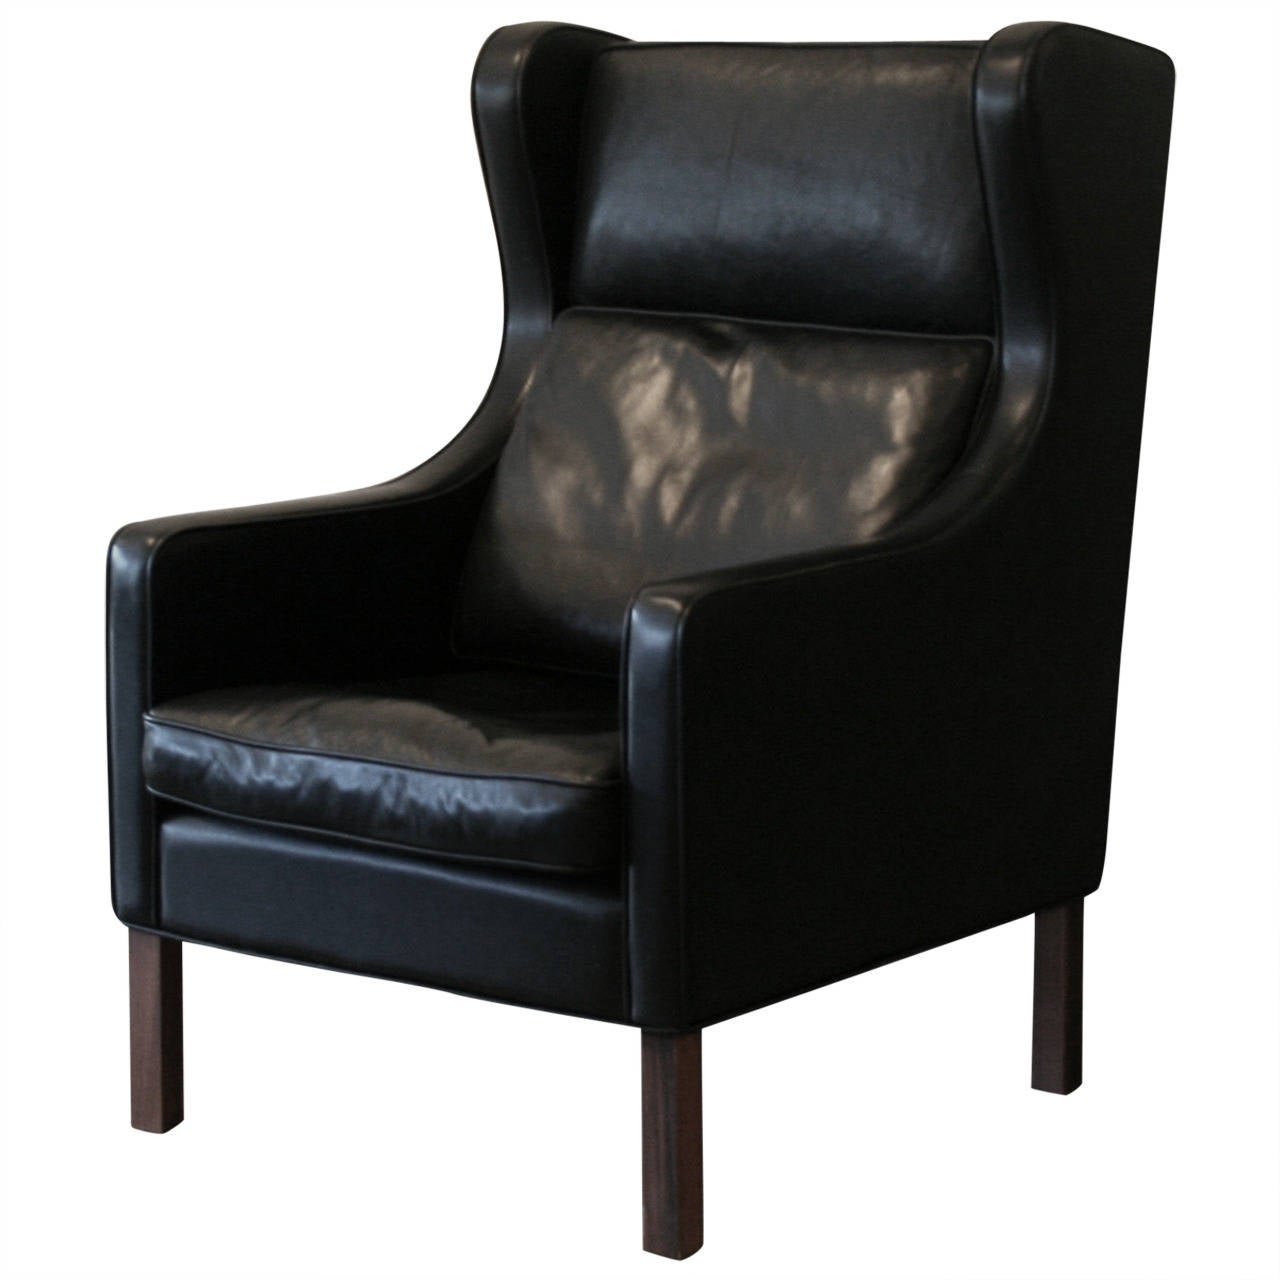 black leather wingback chair adjustable beach vintage danish at 1stdibs